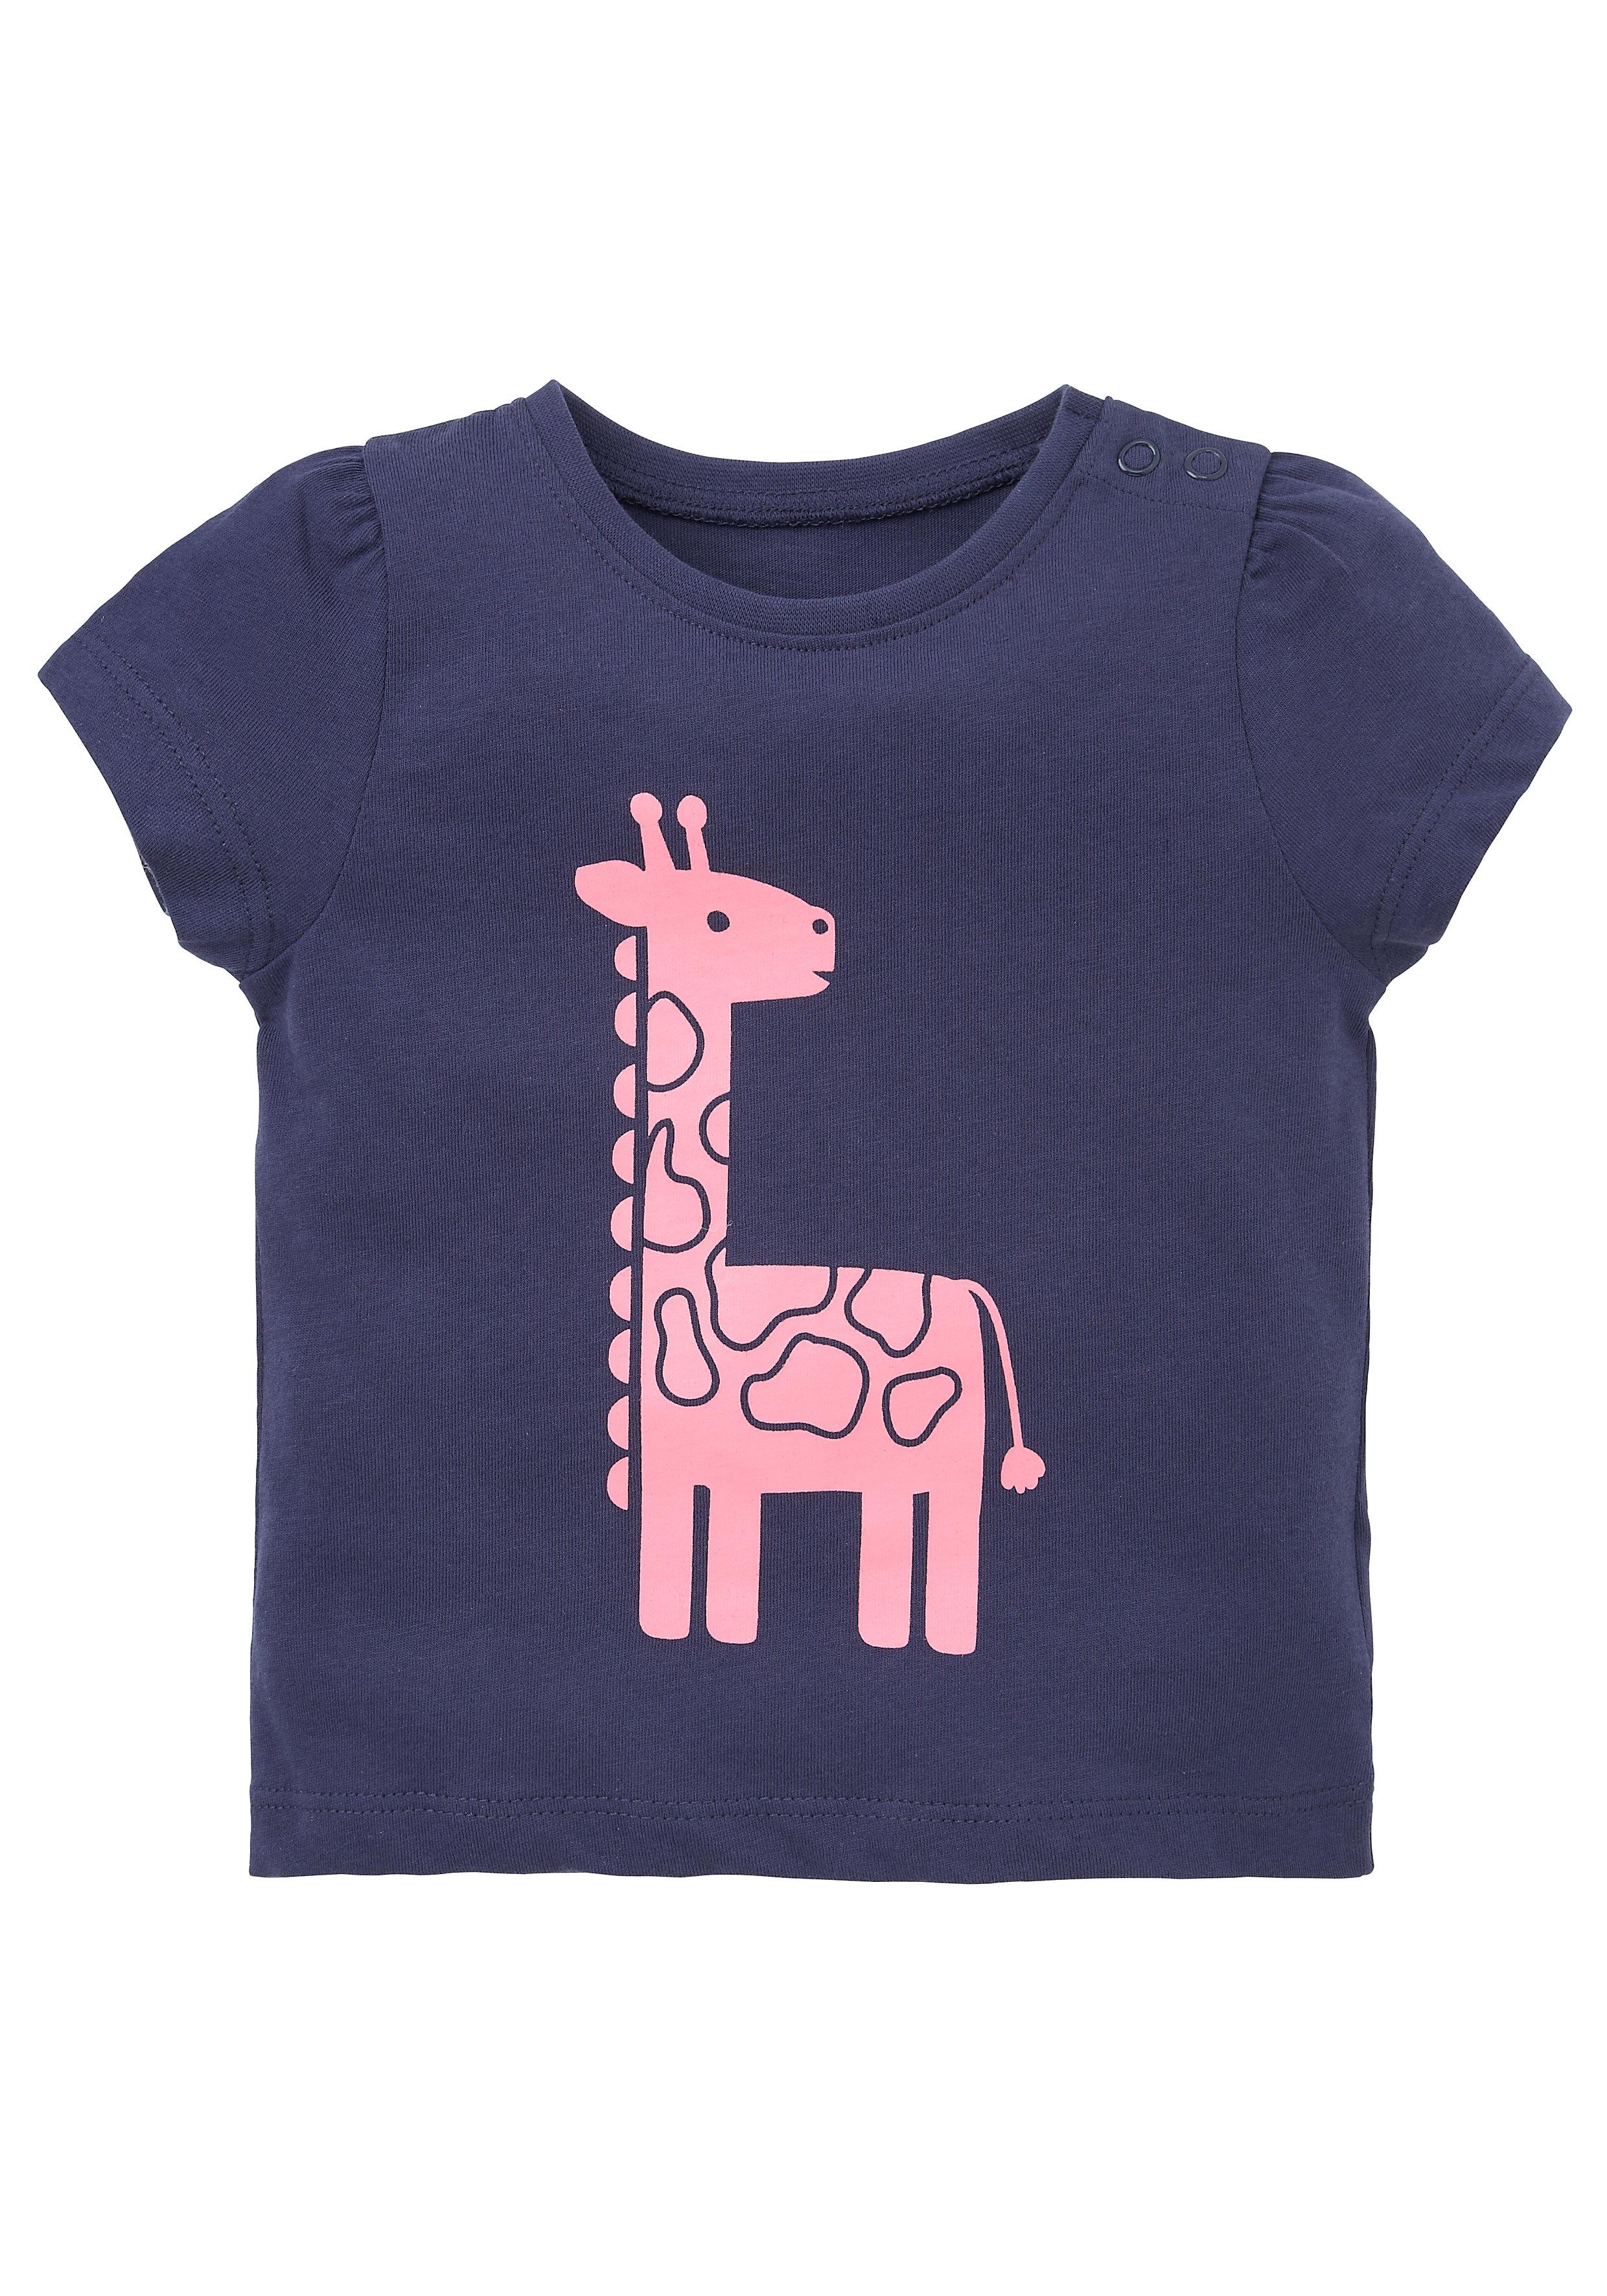 Mothercare   Girls Half Sleeves T-Shirts - Navy